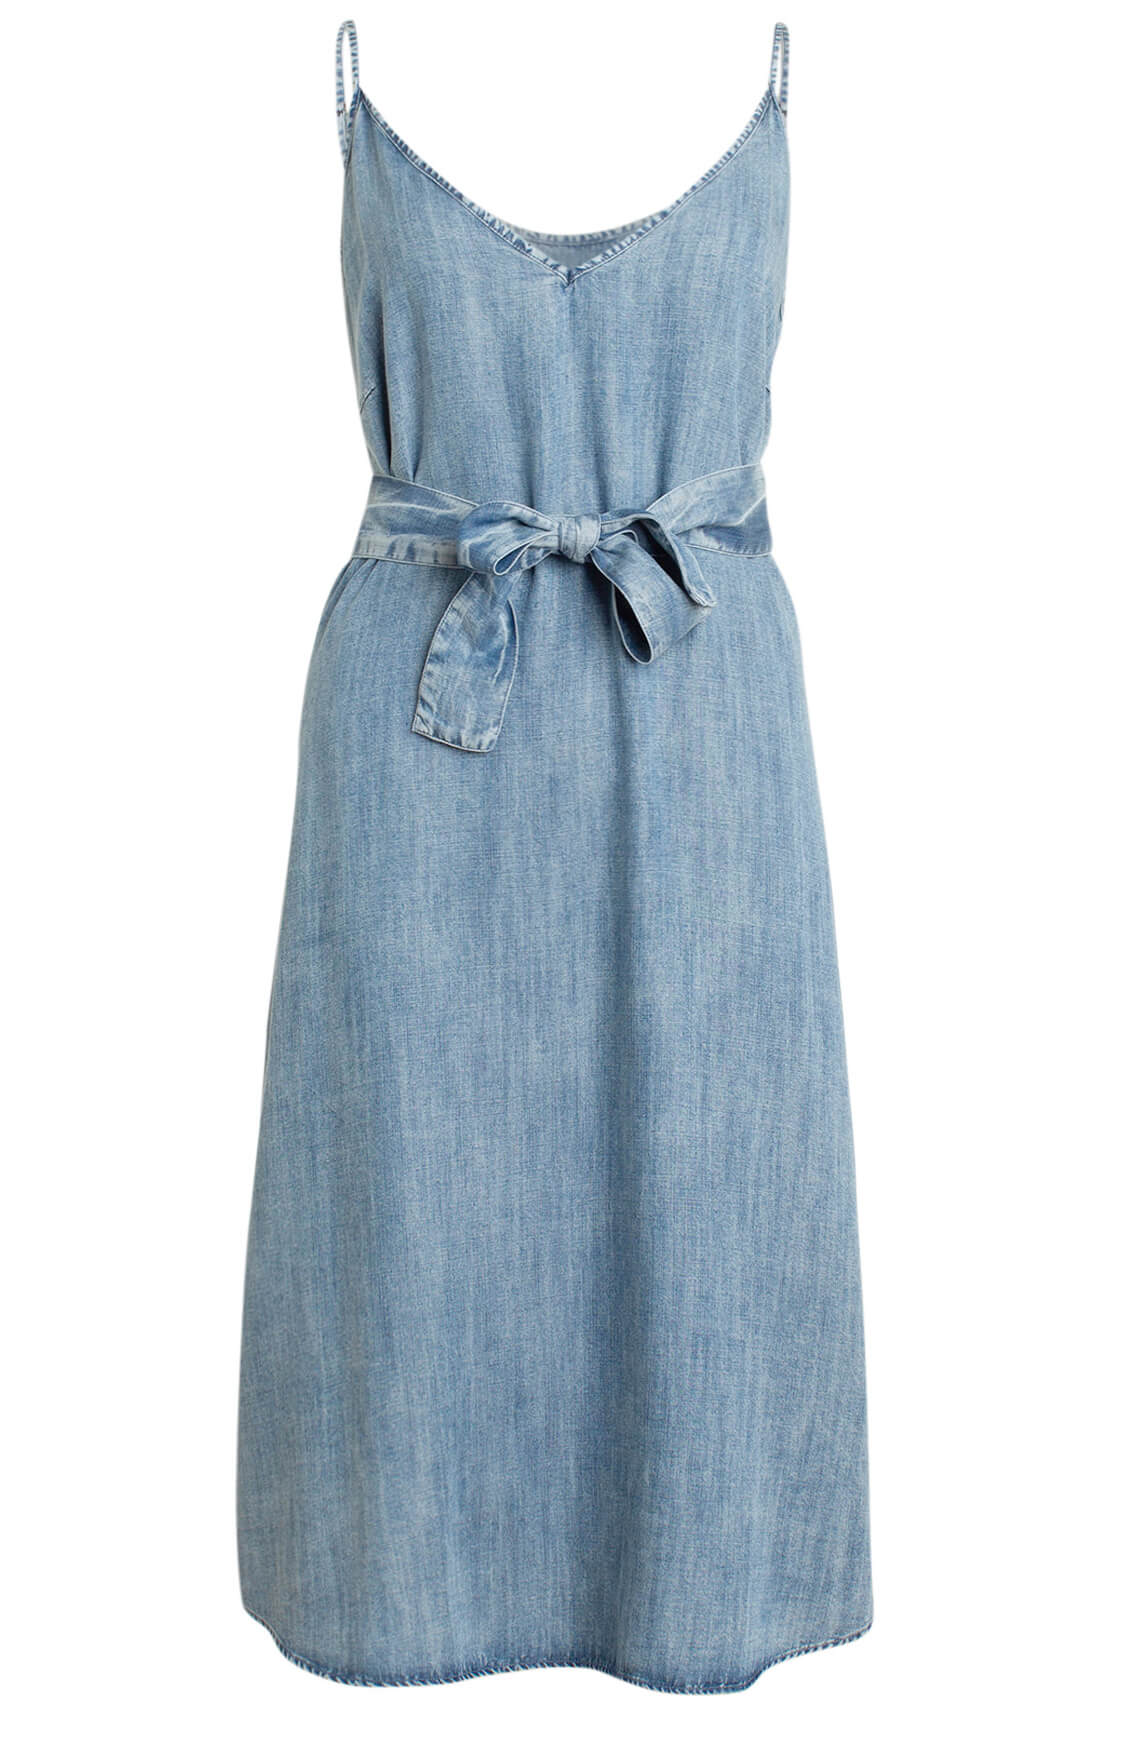 Moscow Dames Mouwloze jeans jurk Blauw